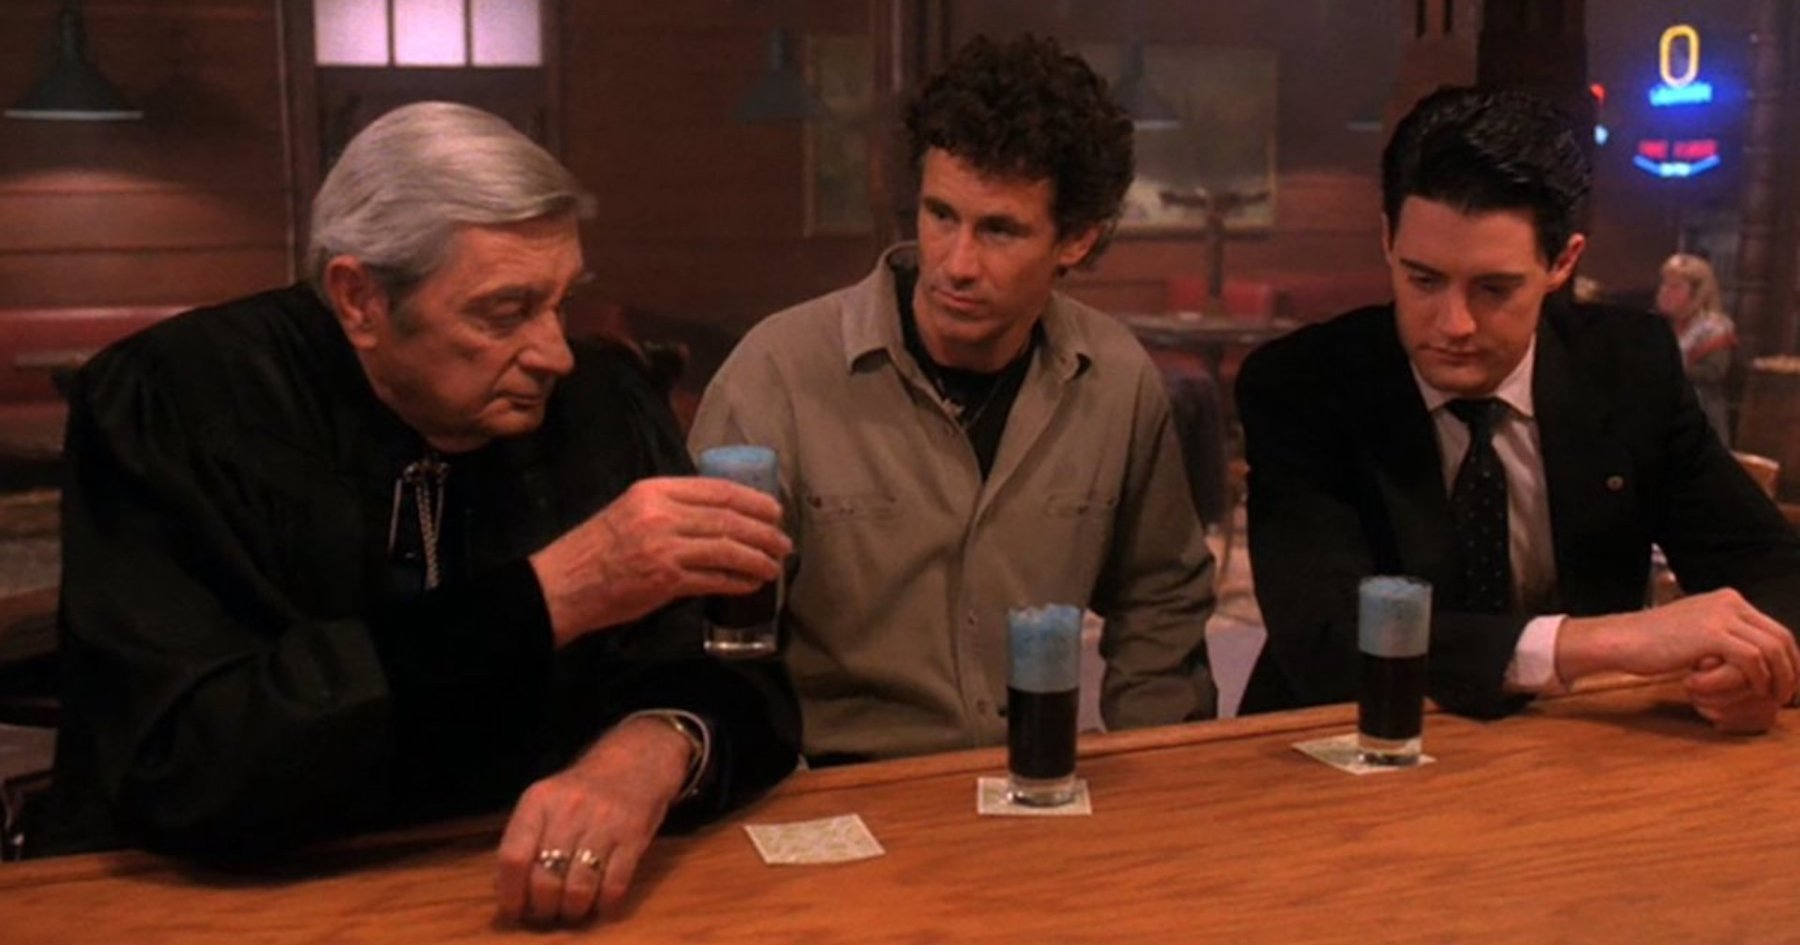 About That Secret Twin Peaks Bar …